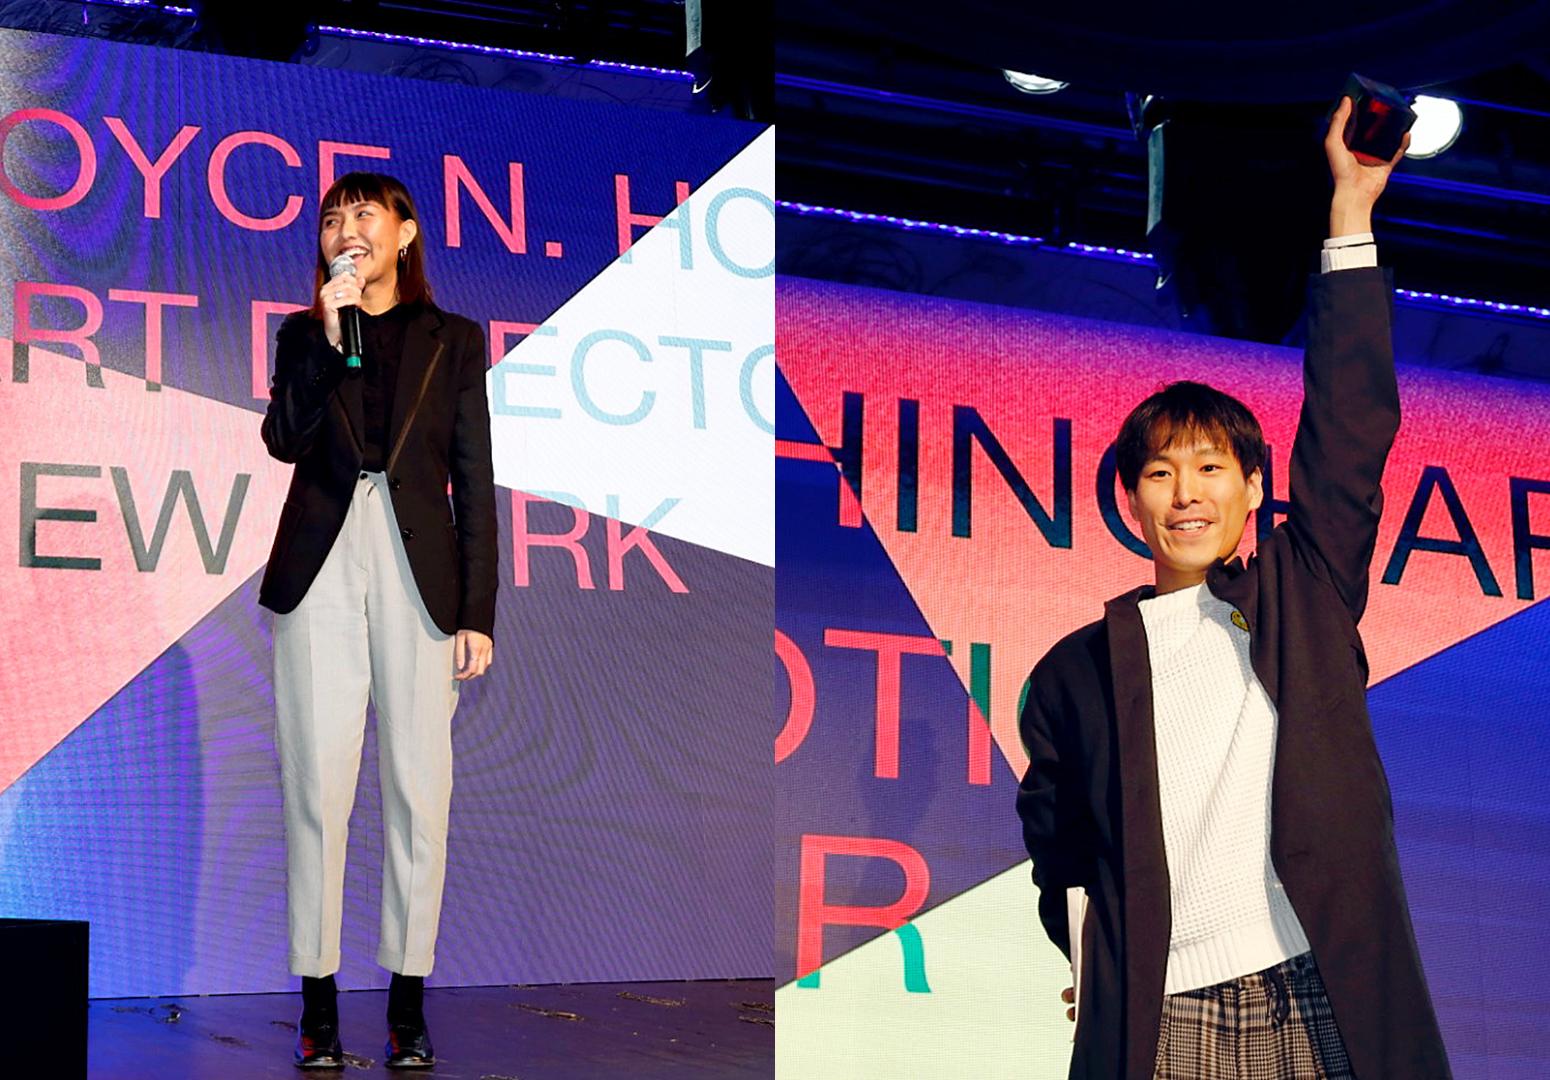 Aussie expat Joyce N. Ho receives Levine/Leavitt Artist In Residence Award at Young Guns 17